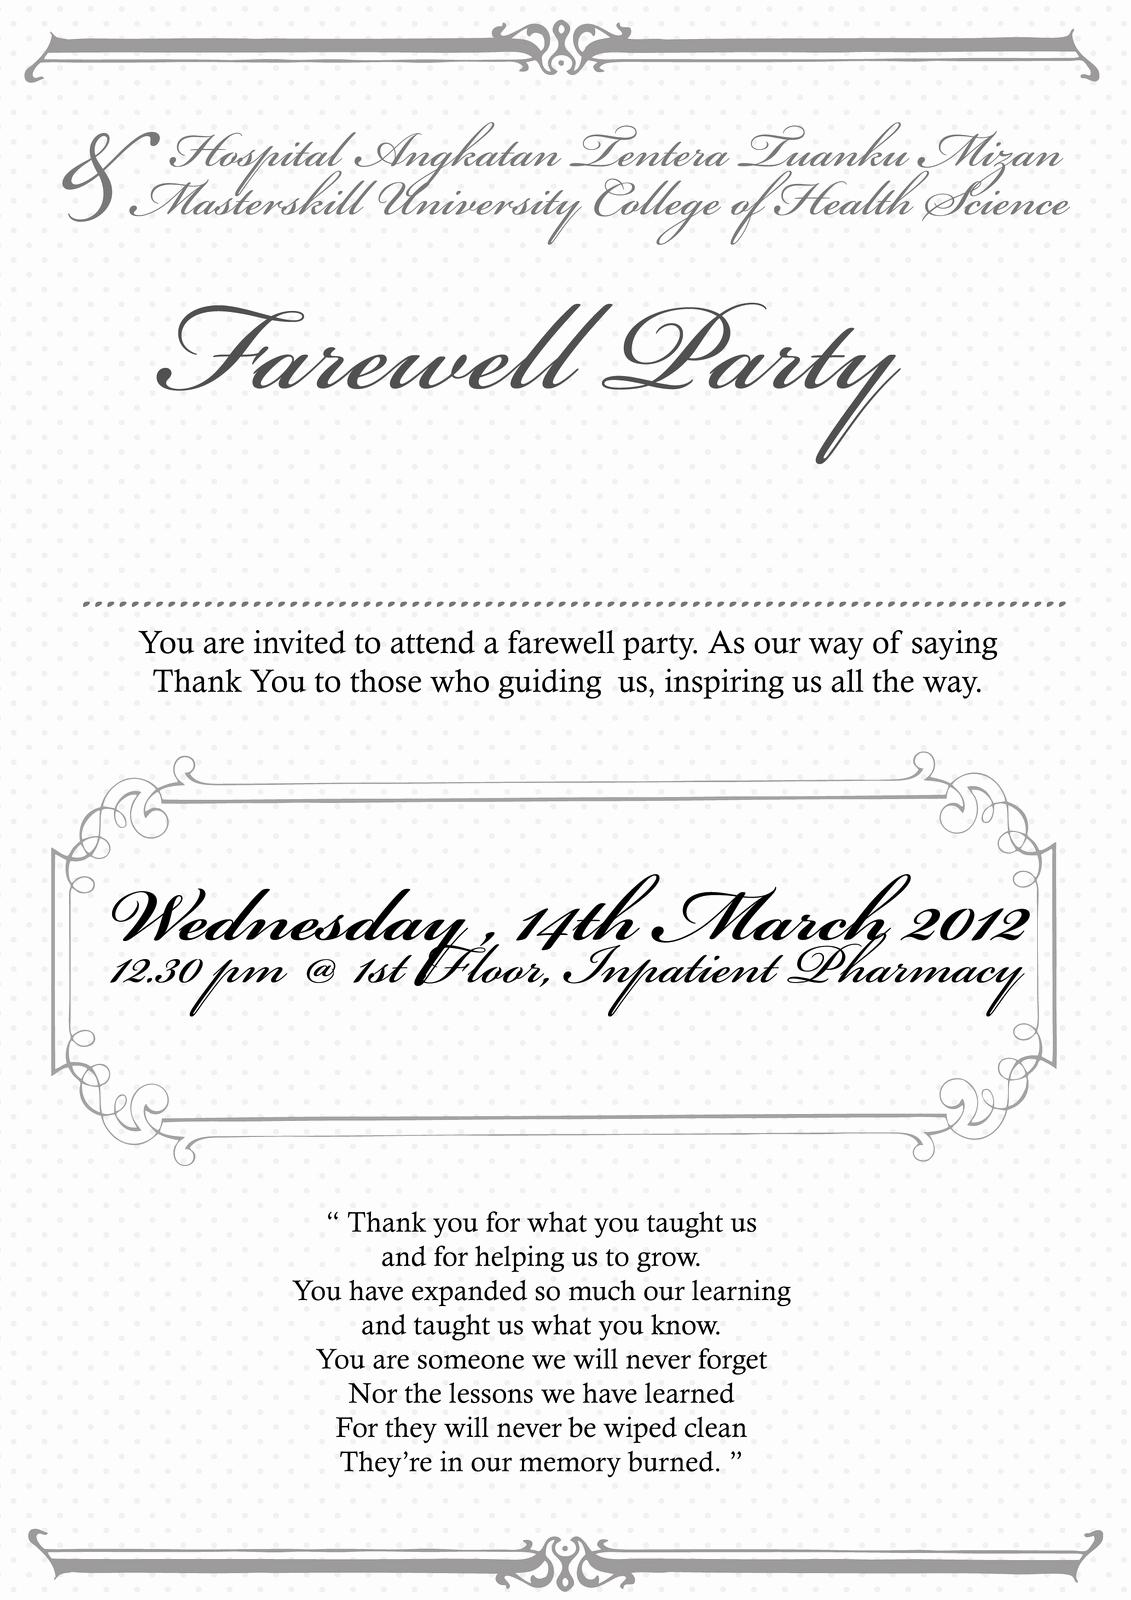 Farewell Party Invitation Wording Elegant Farewell Party Invitation Email